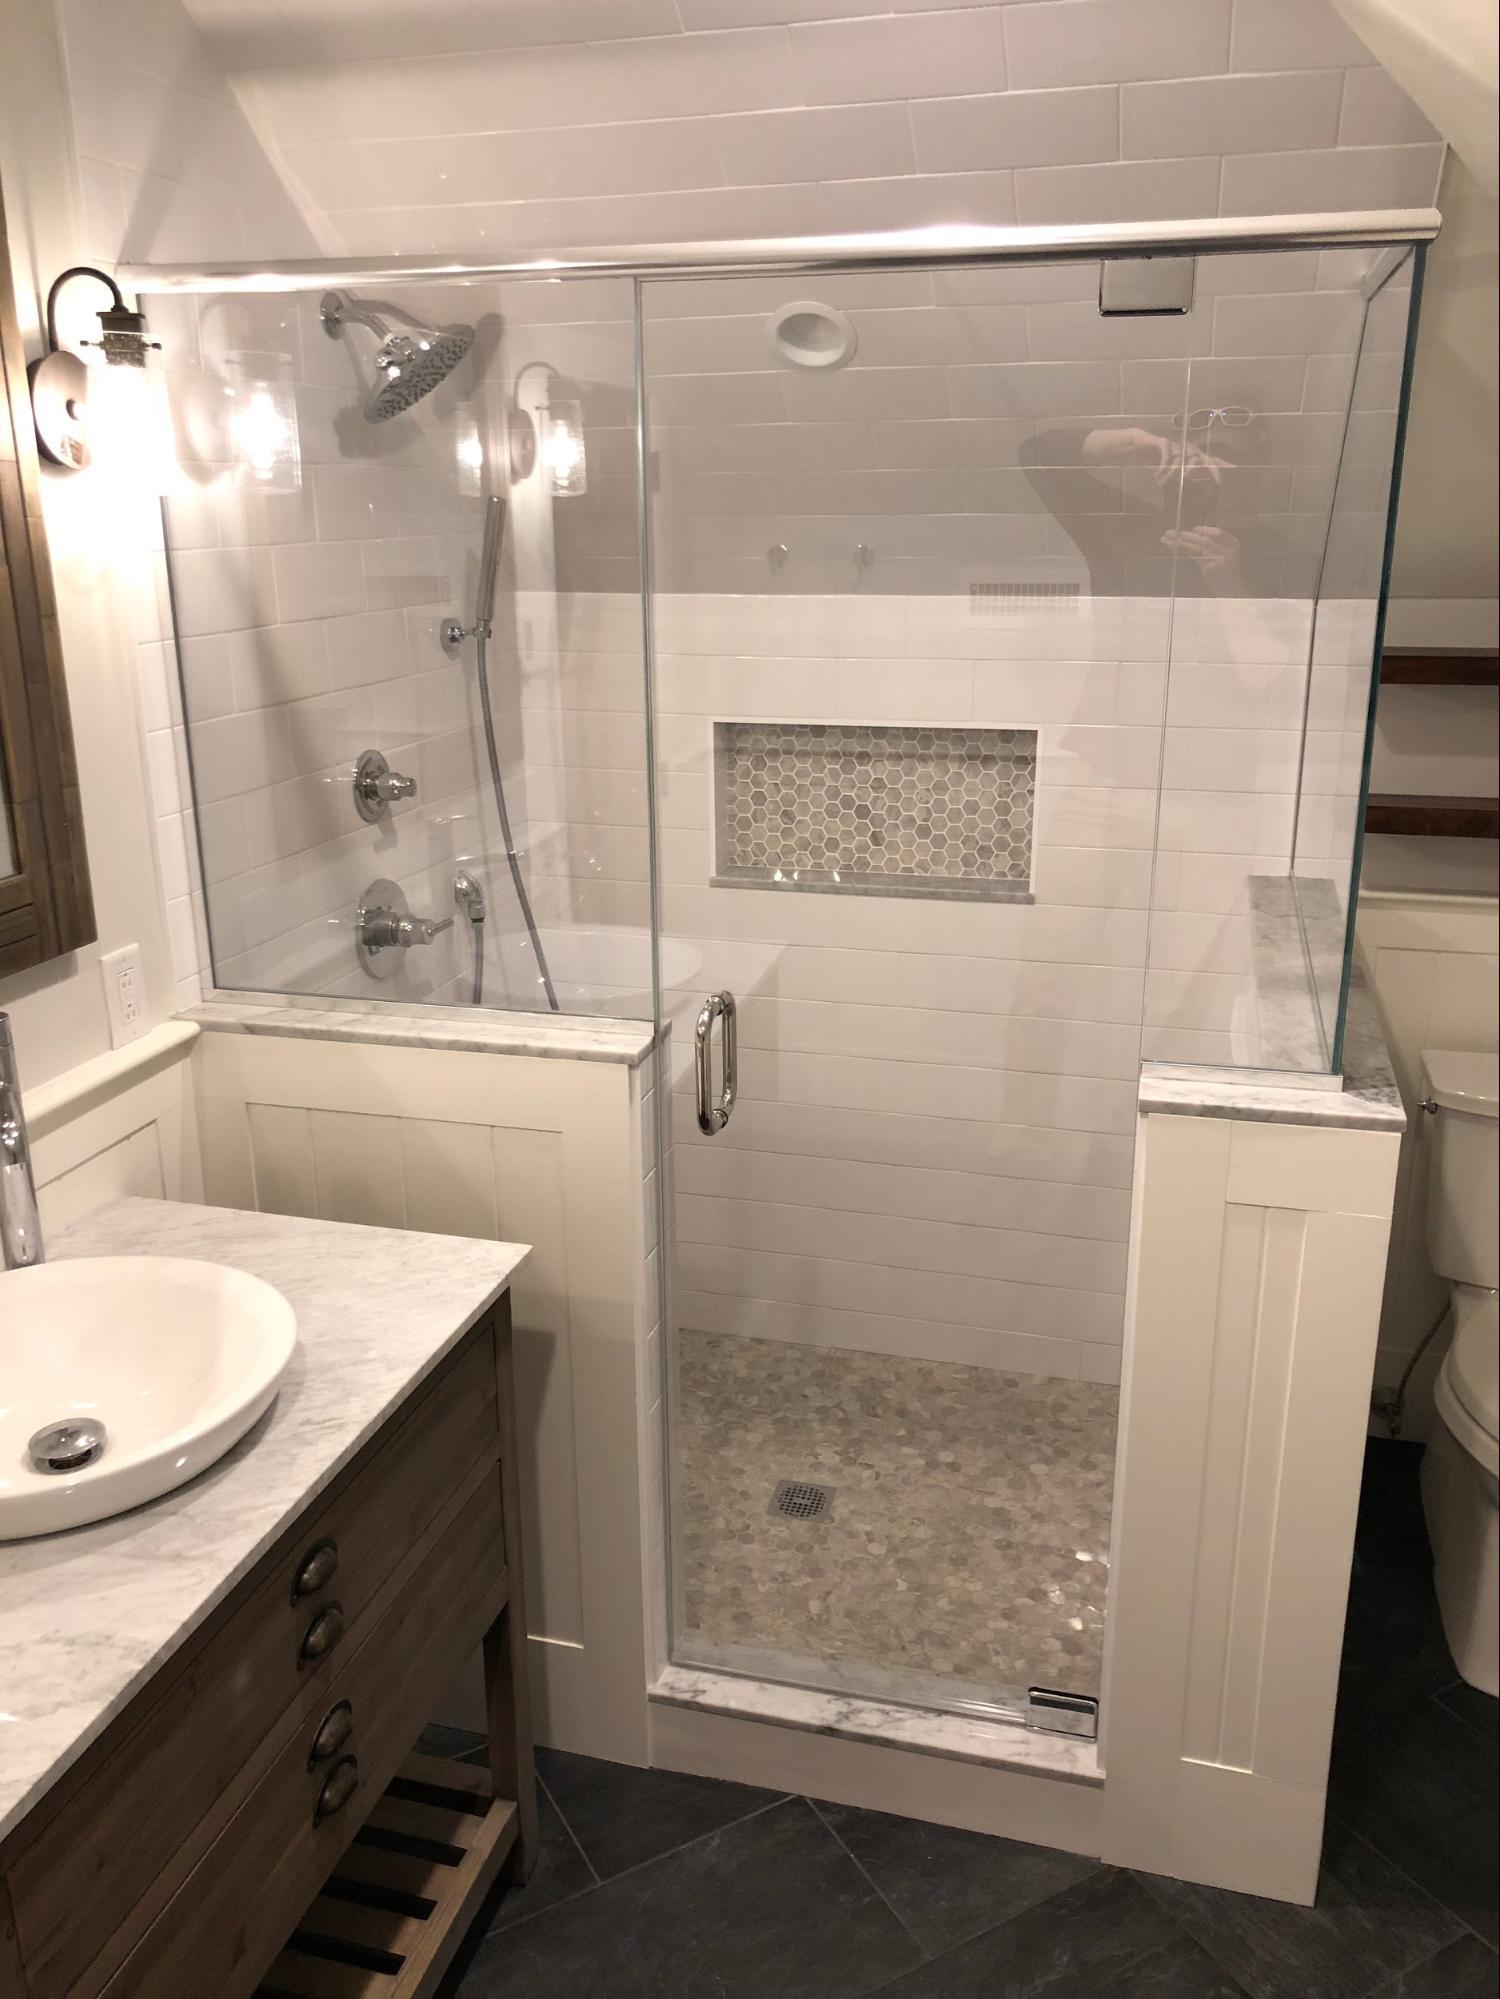 shower-floor-shower-remodel-ideas-beverly-godfrey-design-build.jpg